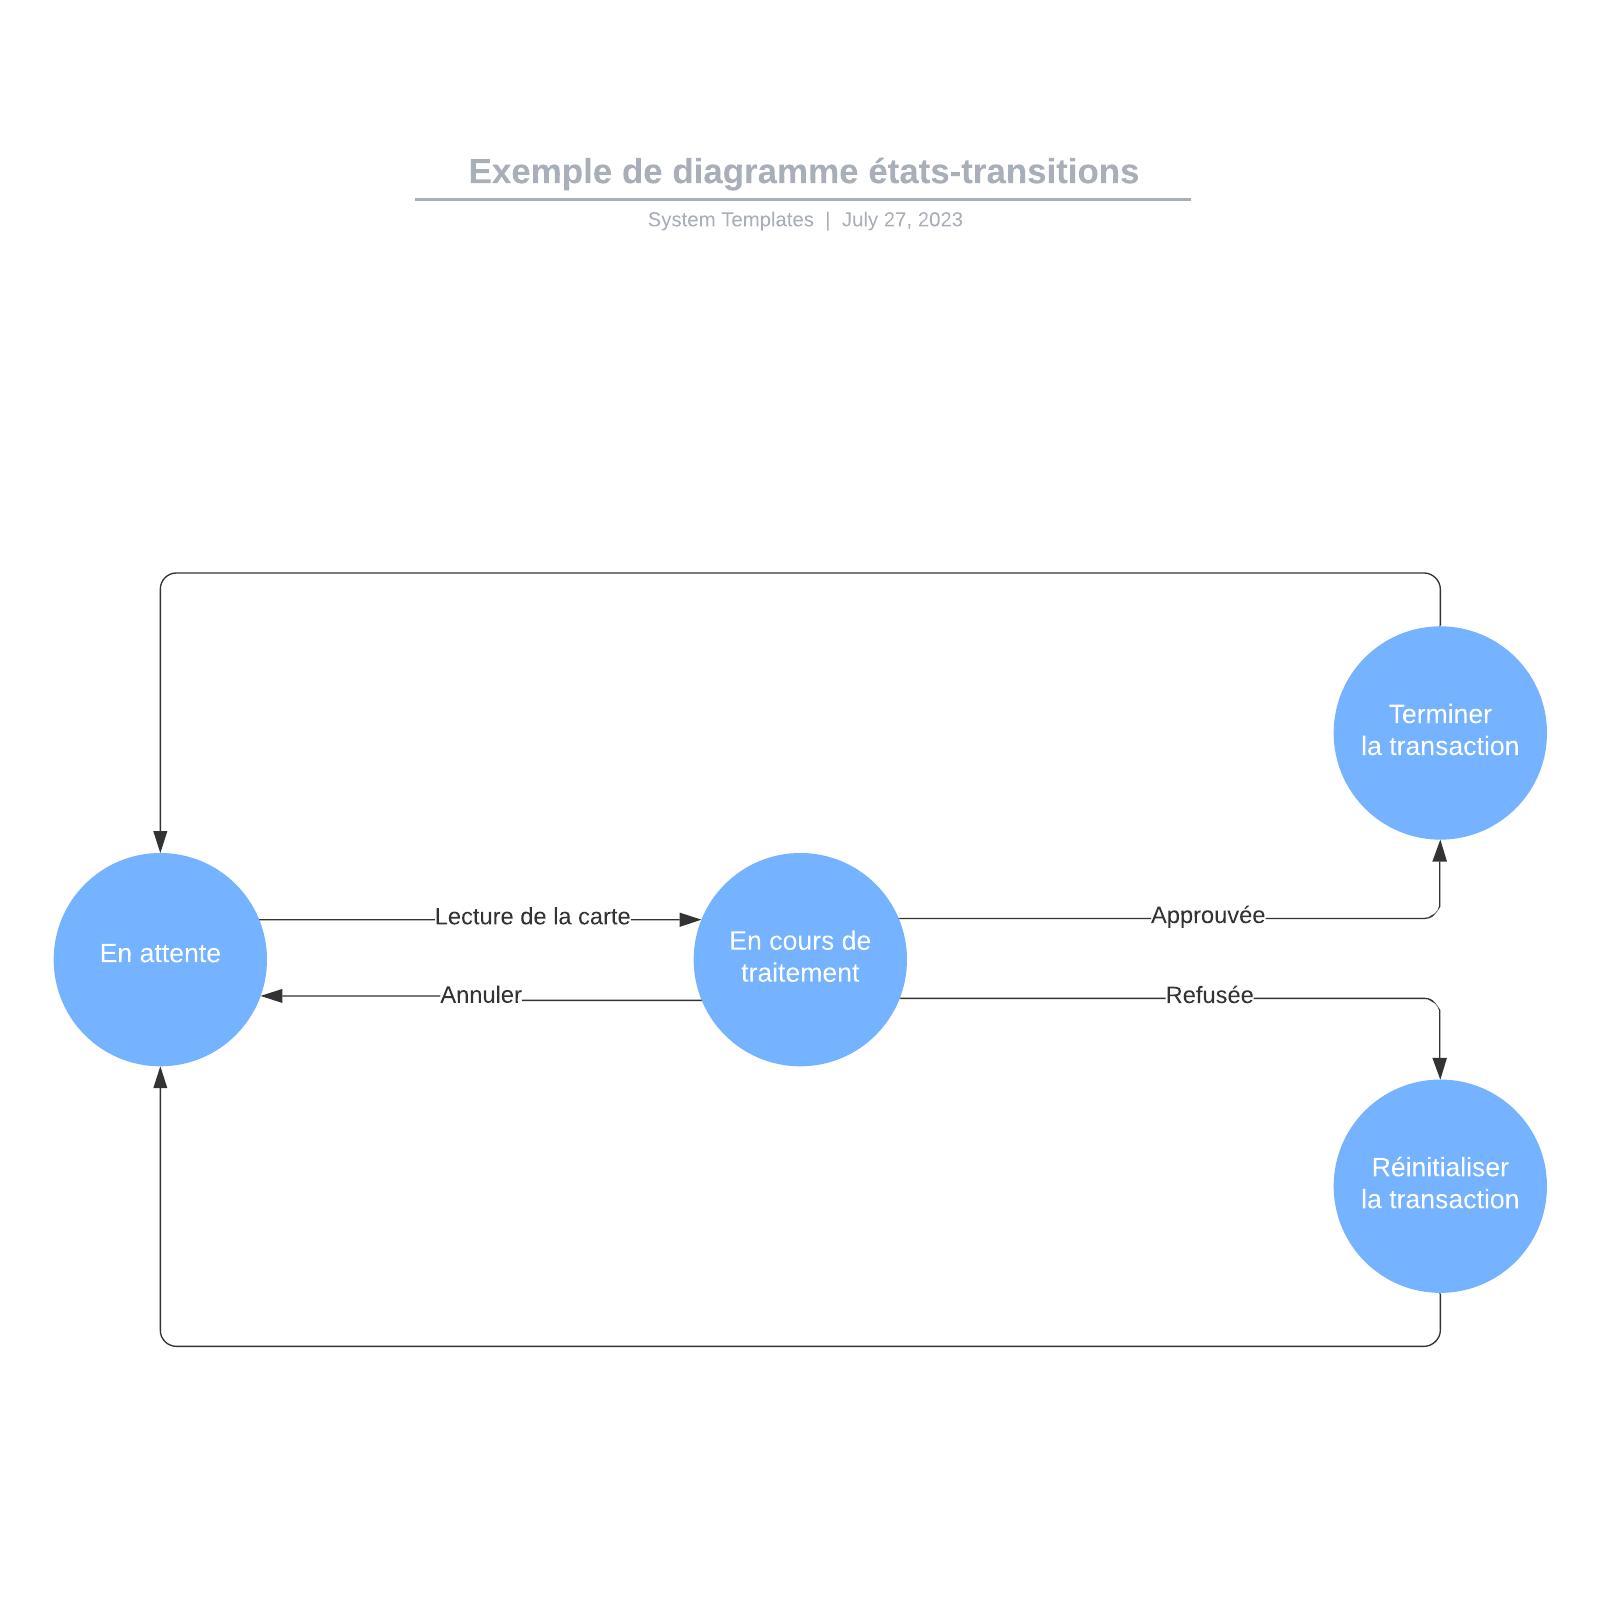 exemple de diagramme états-transitions